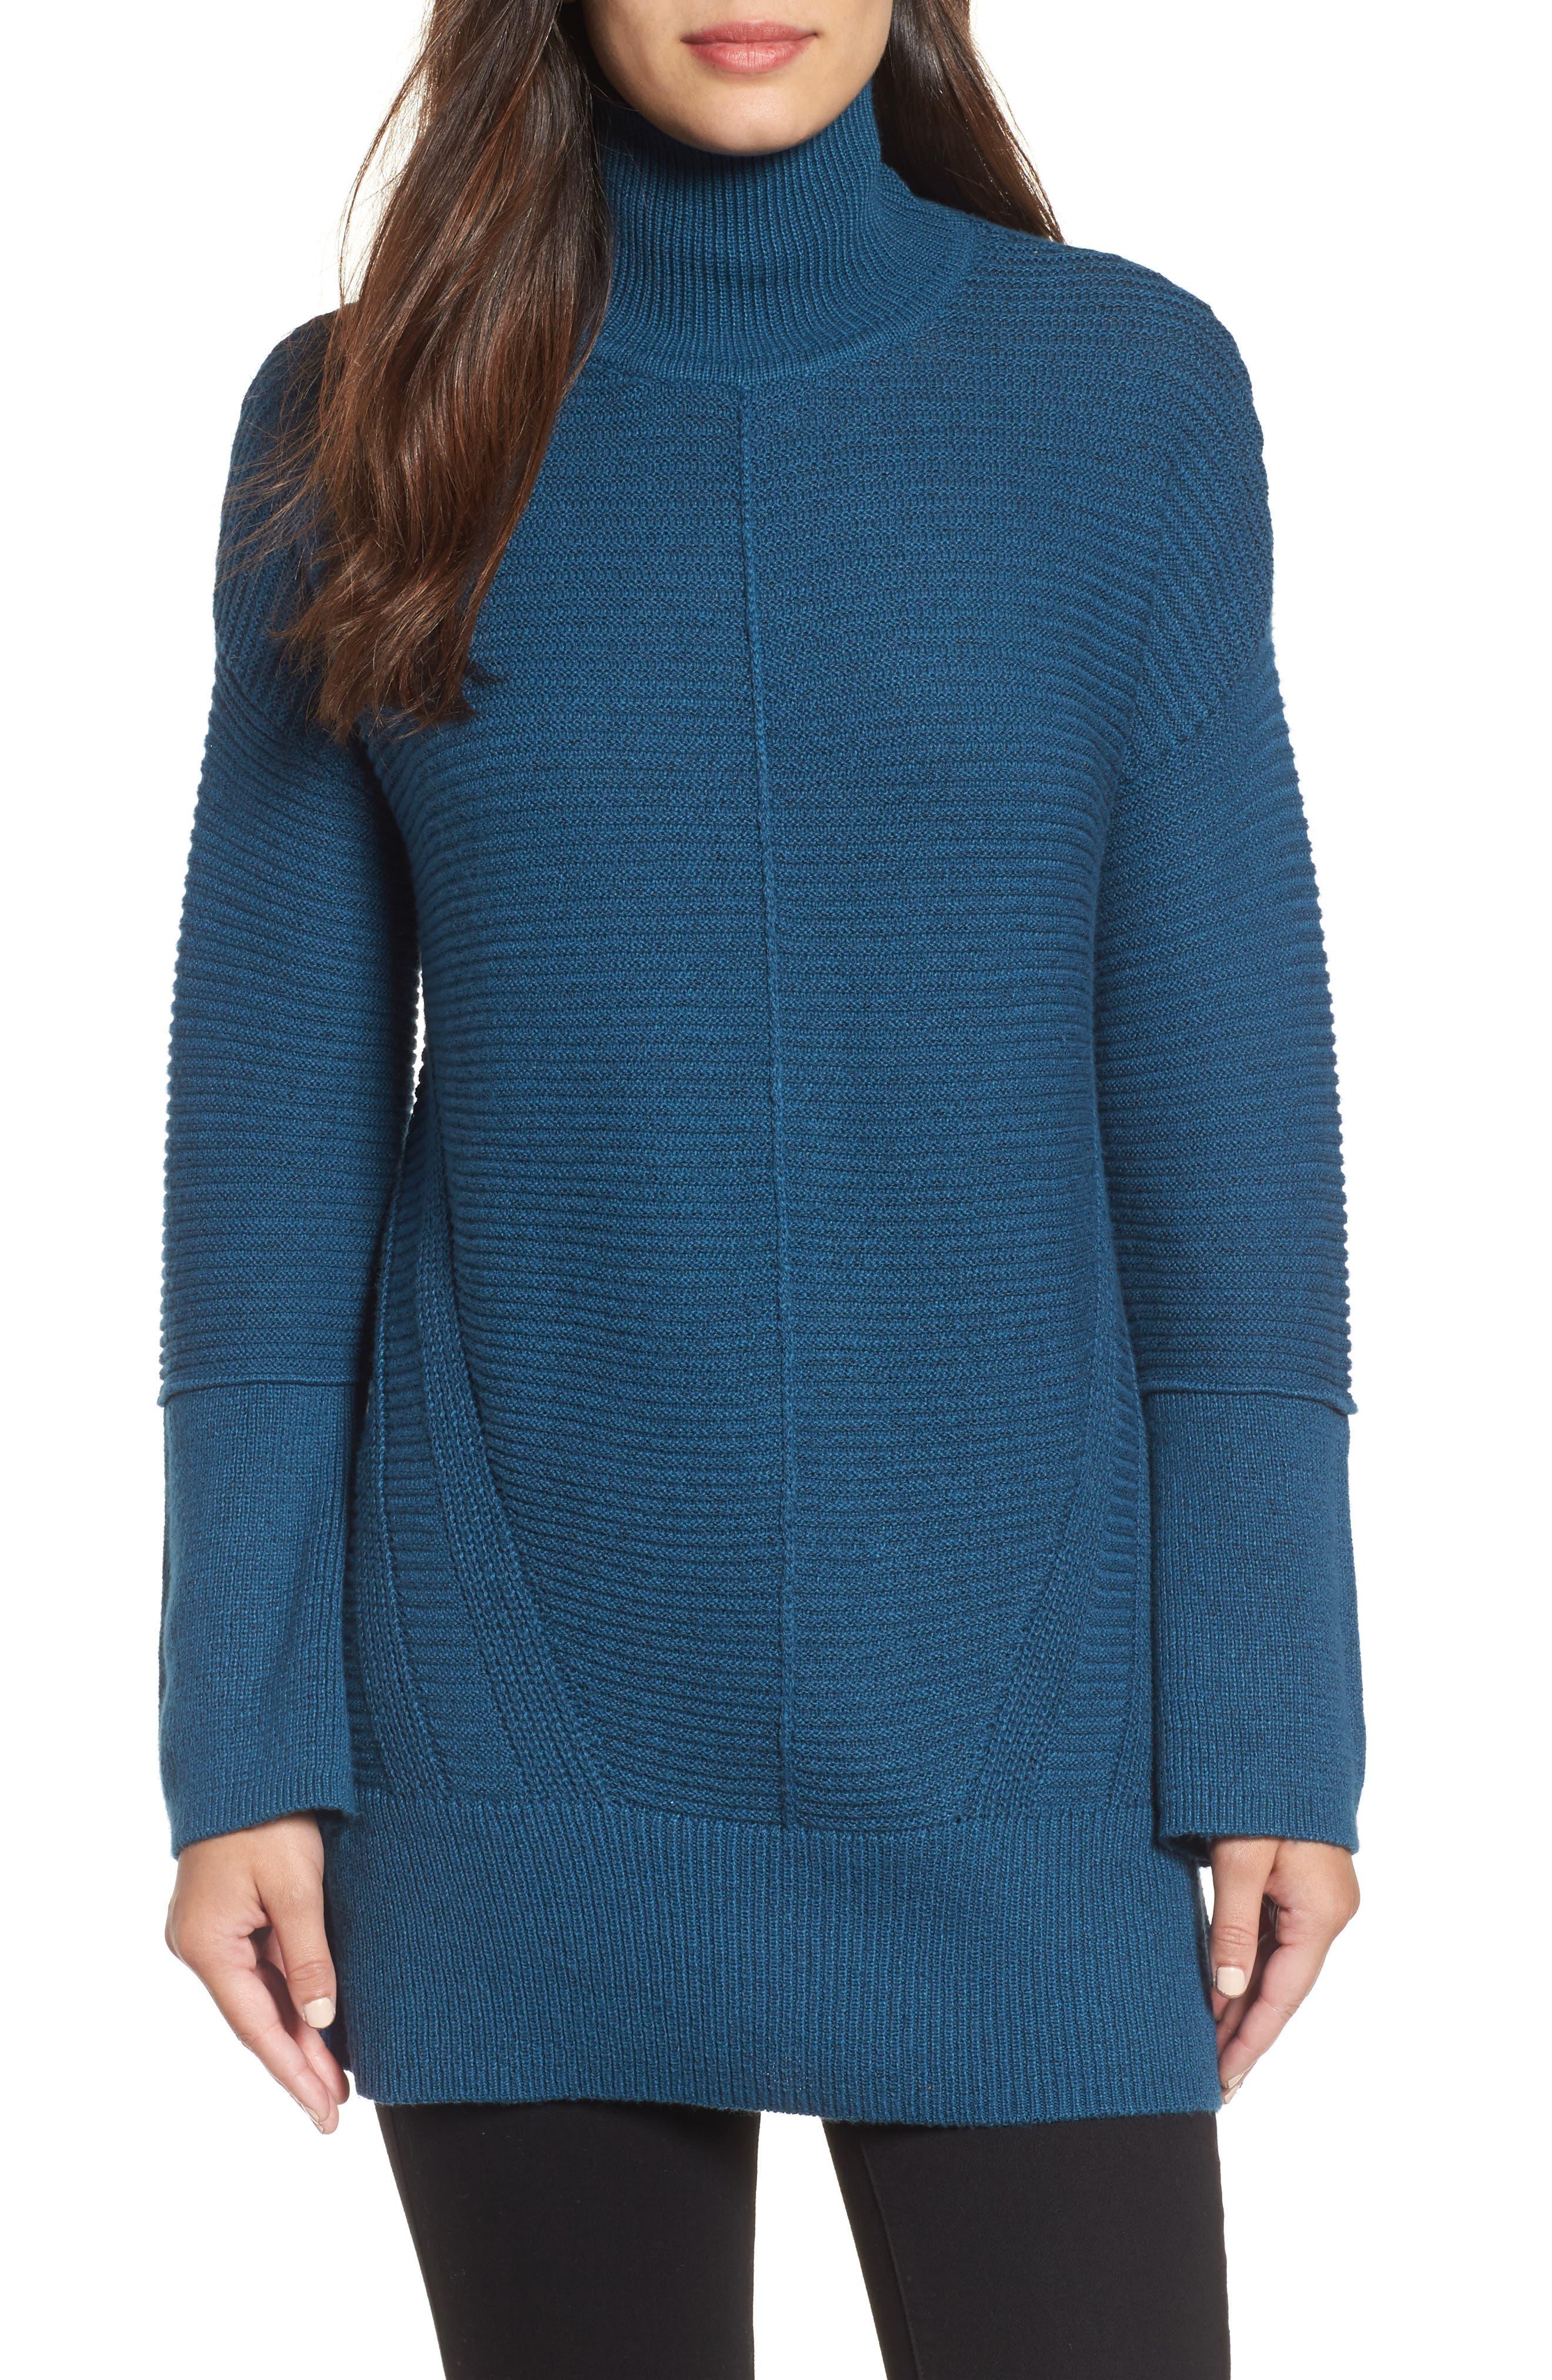 Alternate Image 1 Selected - Caslon® Ribbed Turtleneck Tunic Sweater